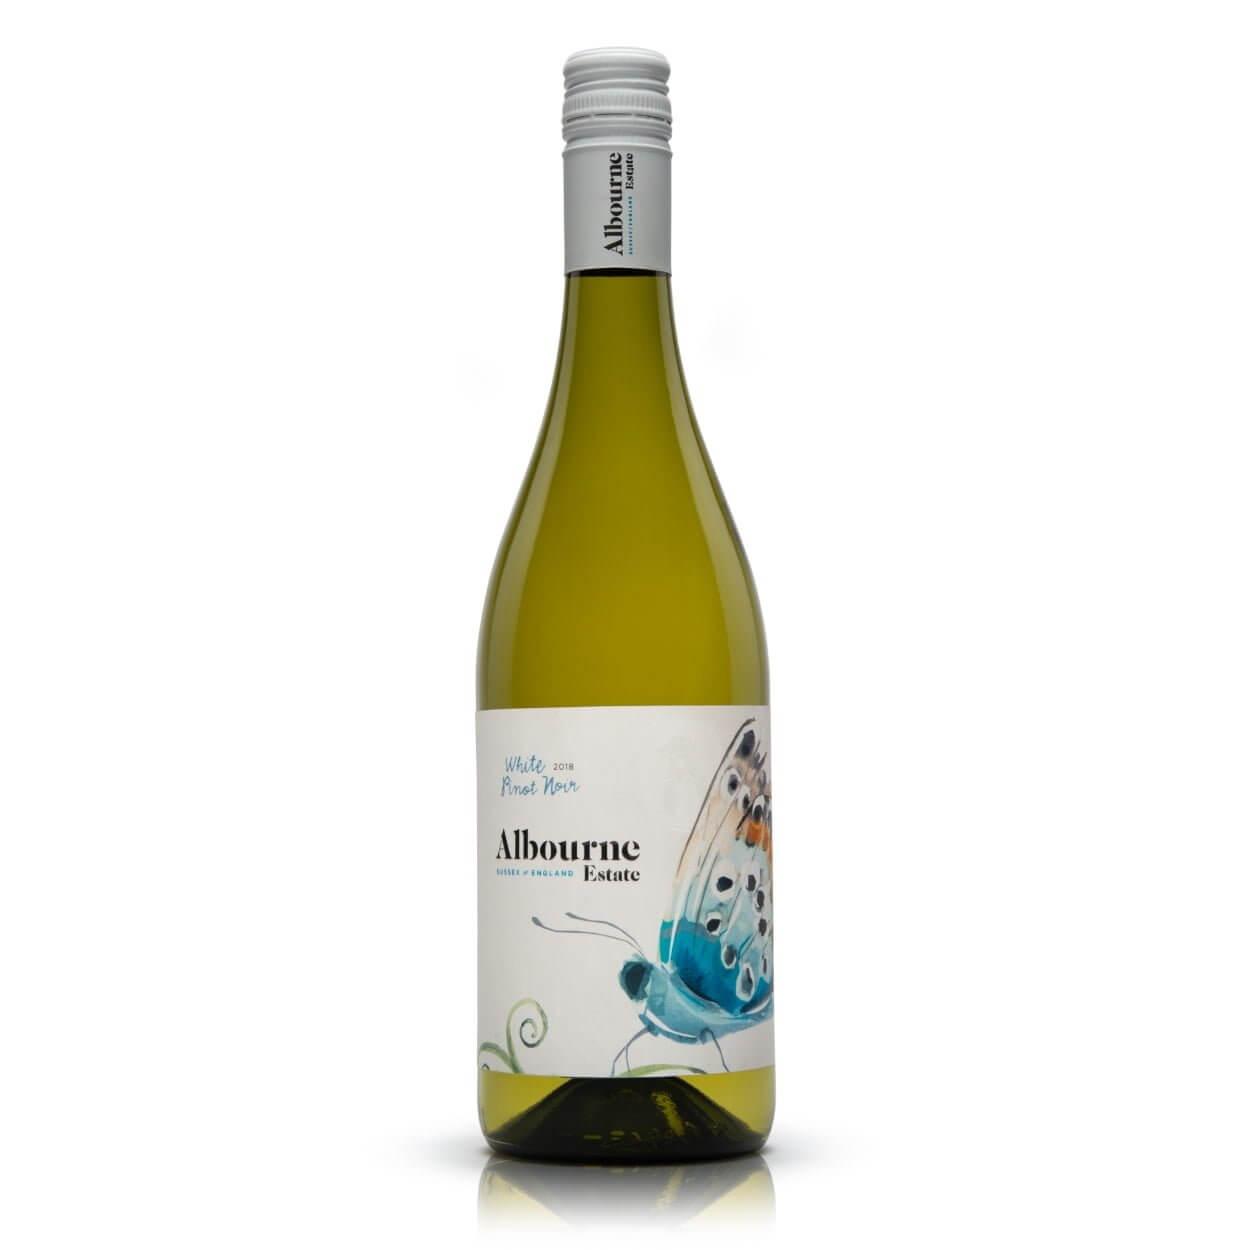 Albourne Estate White Pinot Noir 2018 English wine